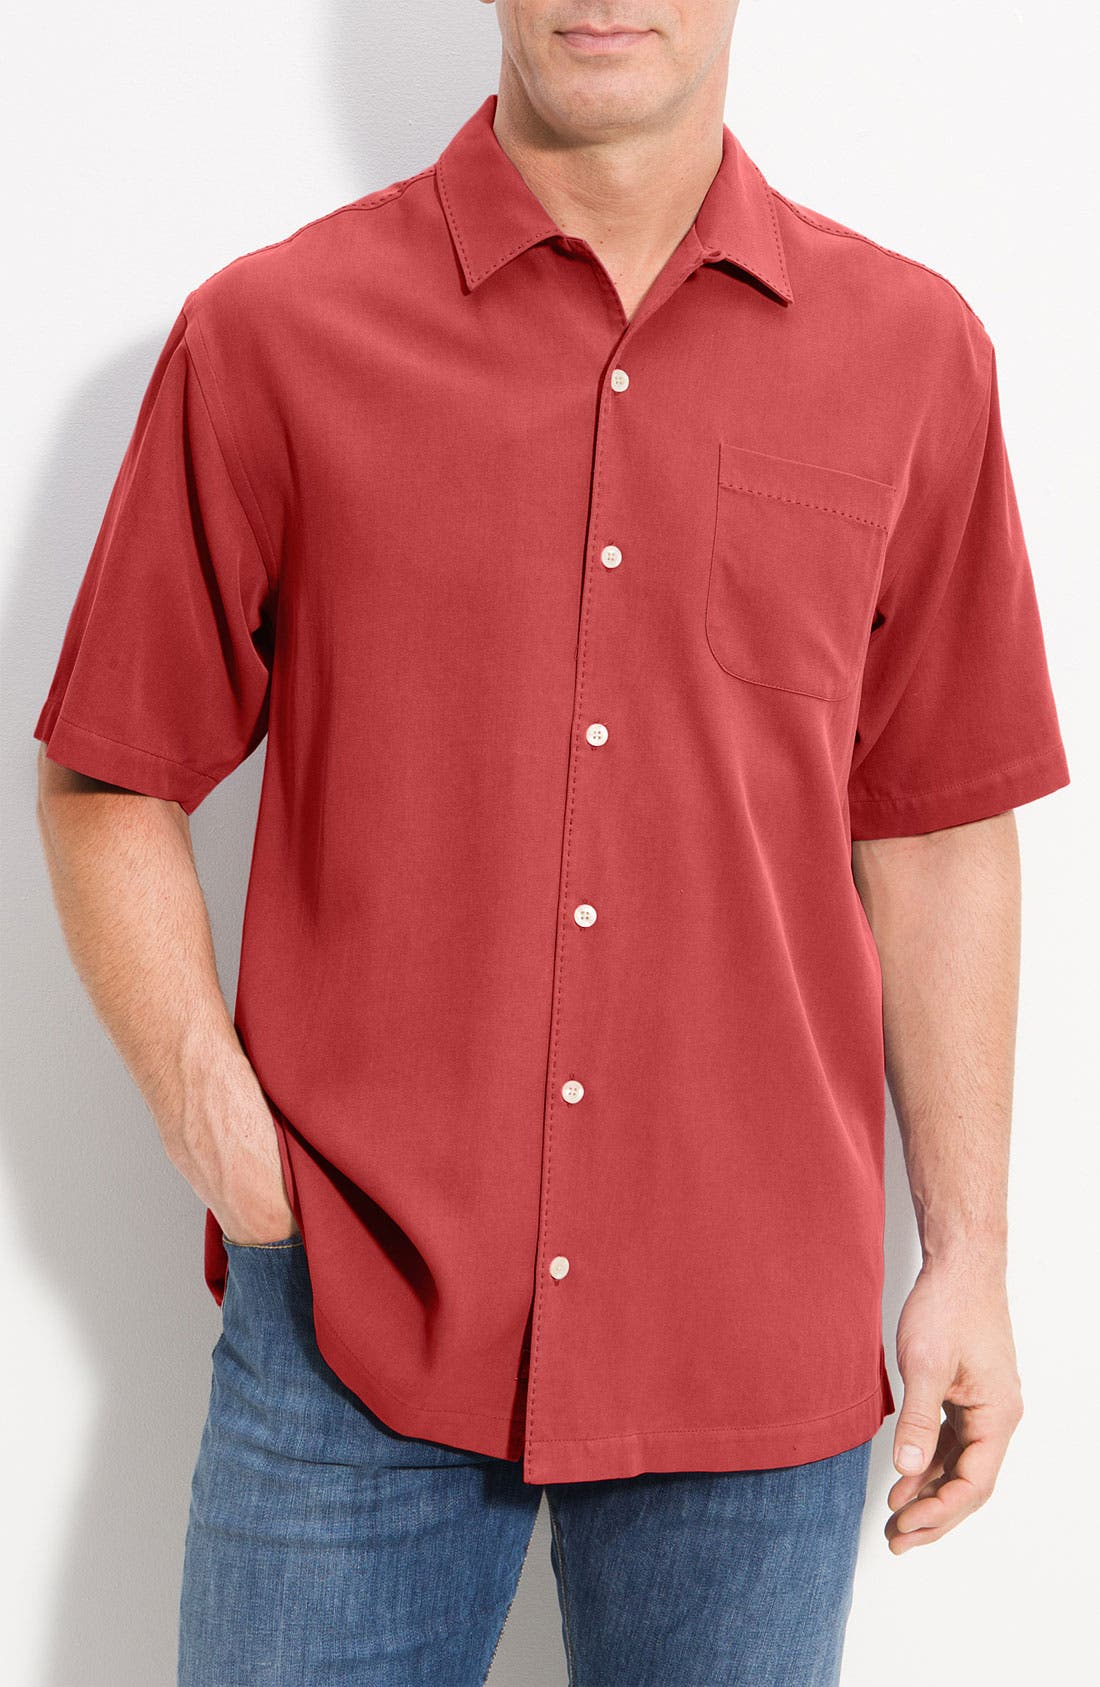 Alternate Image 1 Selected - Tommy Bahama 'Catalina Twill' Original Fit Silk Camp Shirt